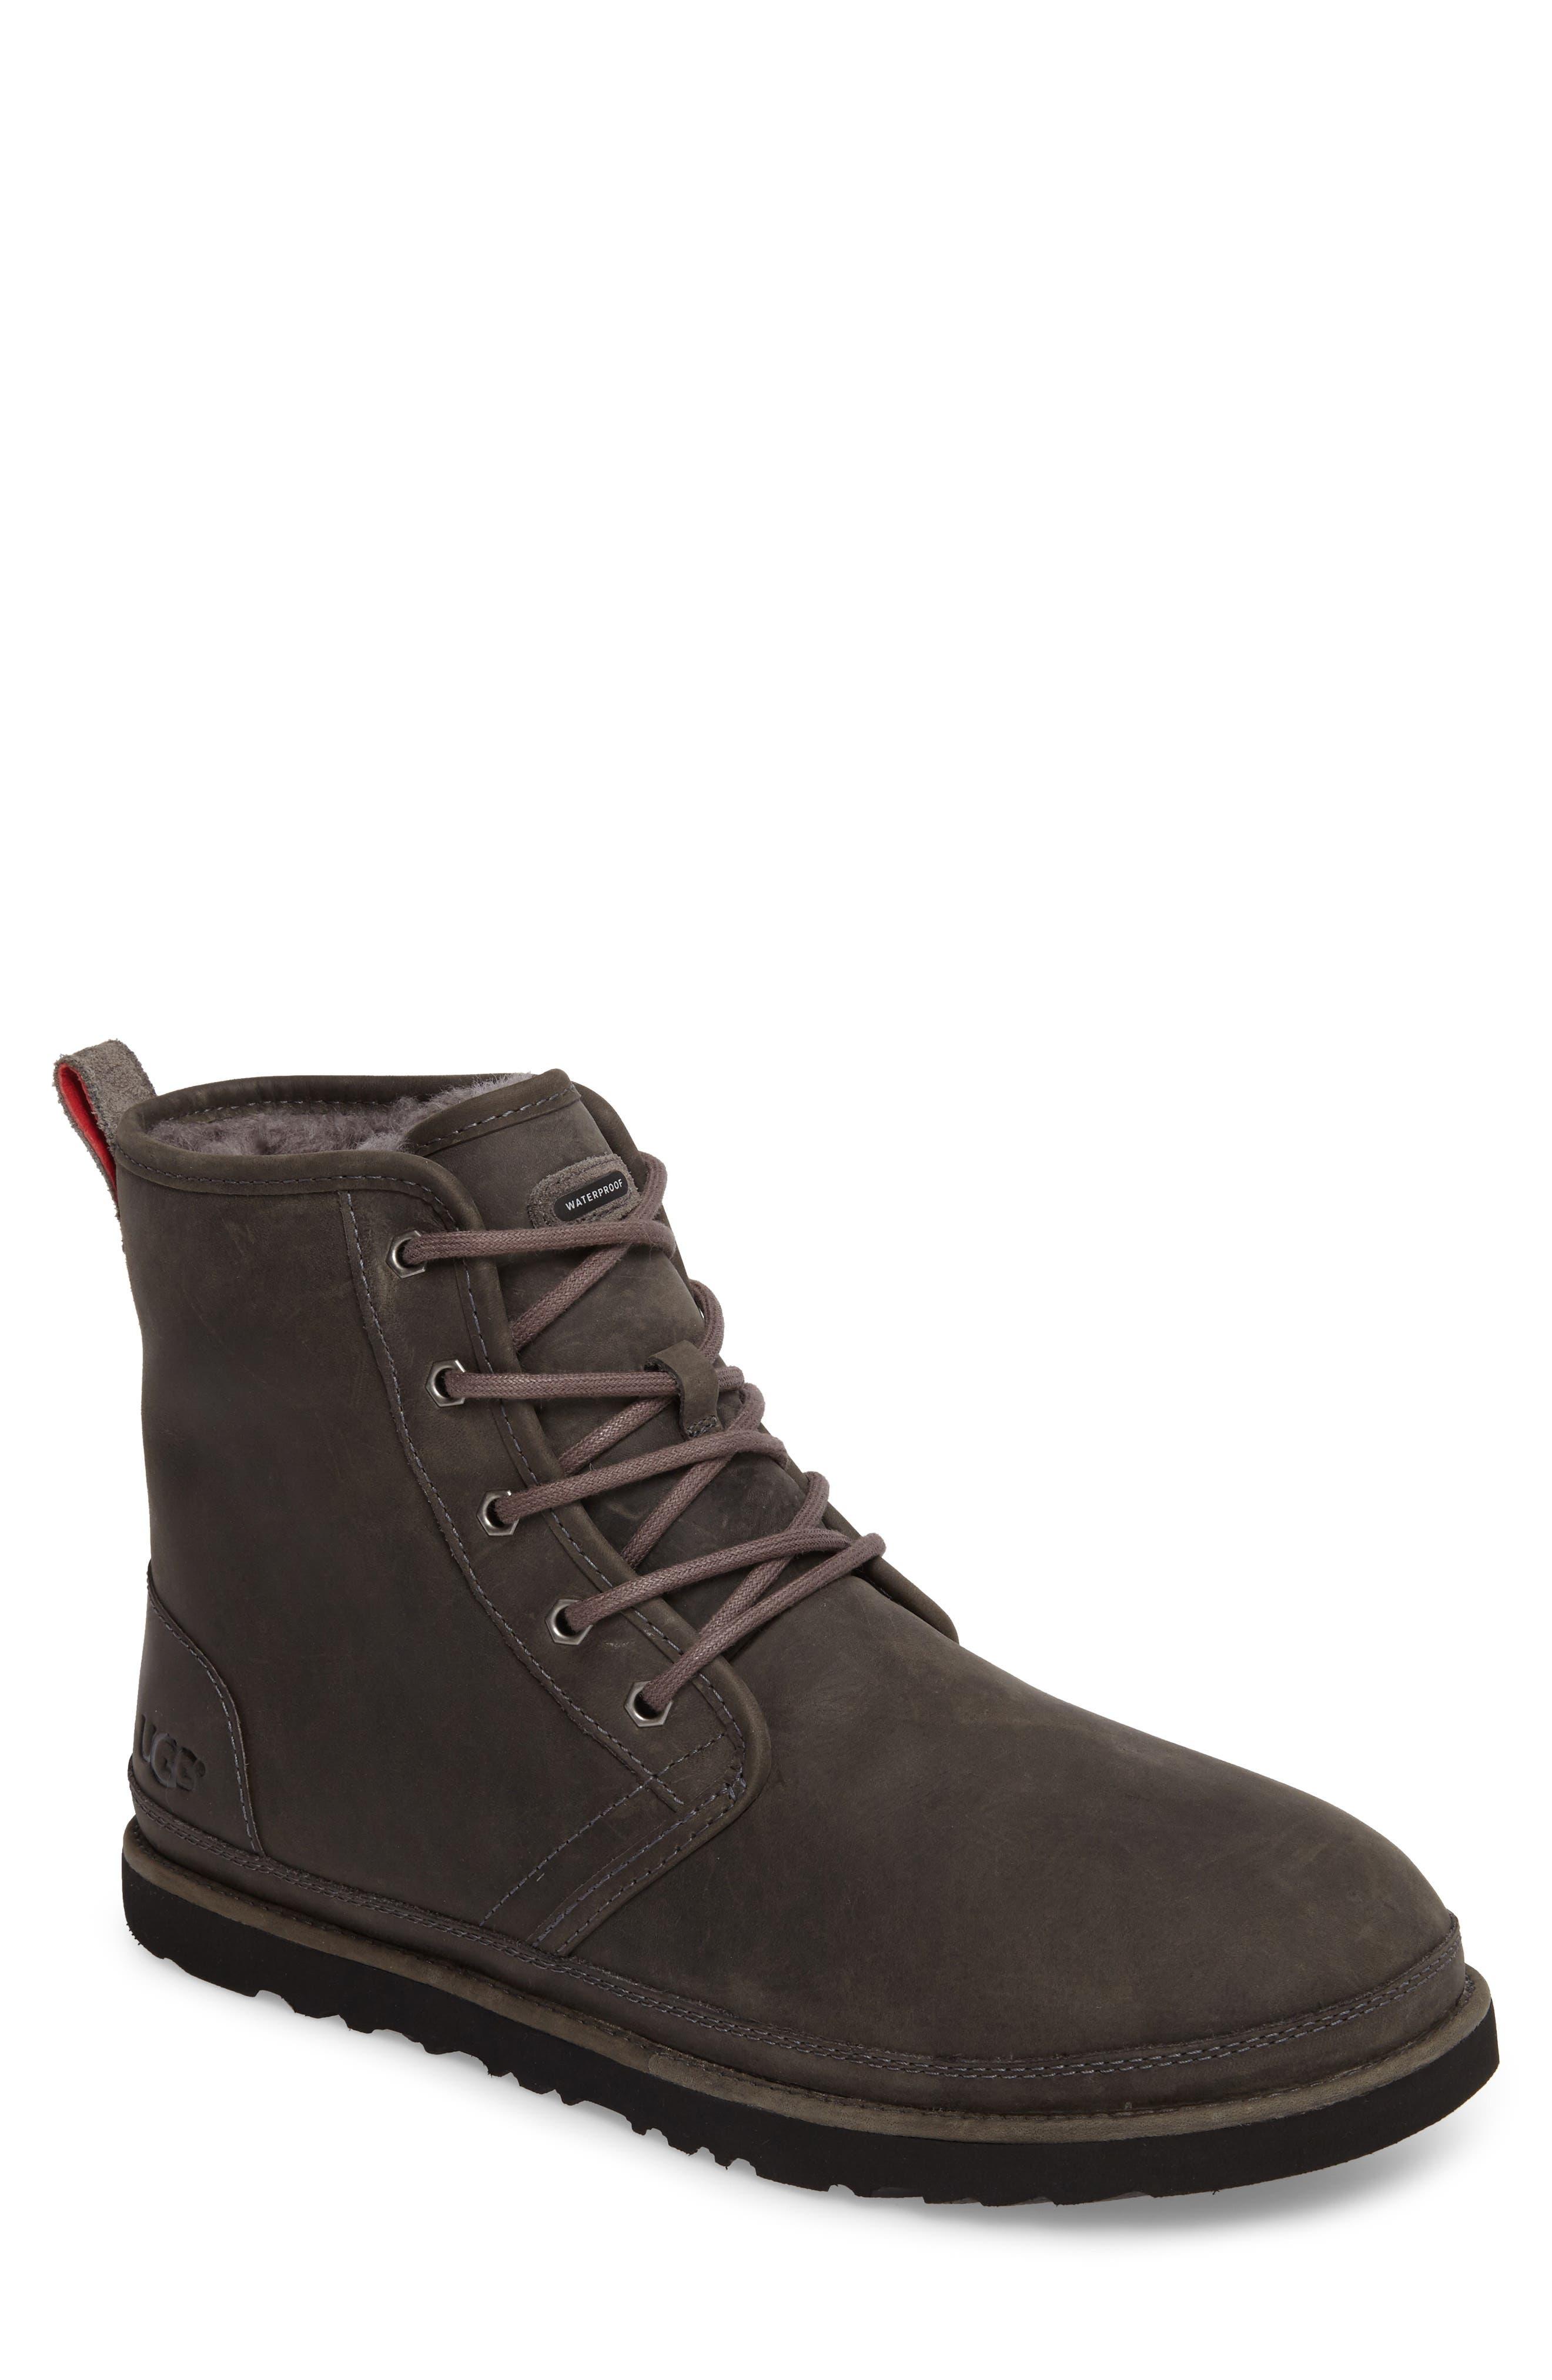 Harkley Plain Toe Waterproof Waterproof Boot, Main, color, CHARCOAL